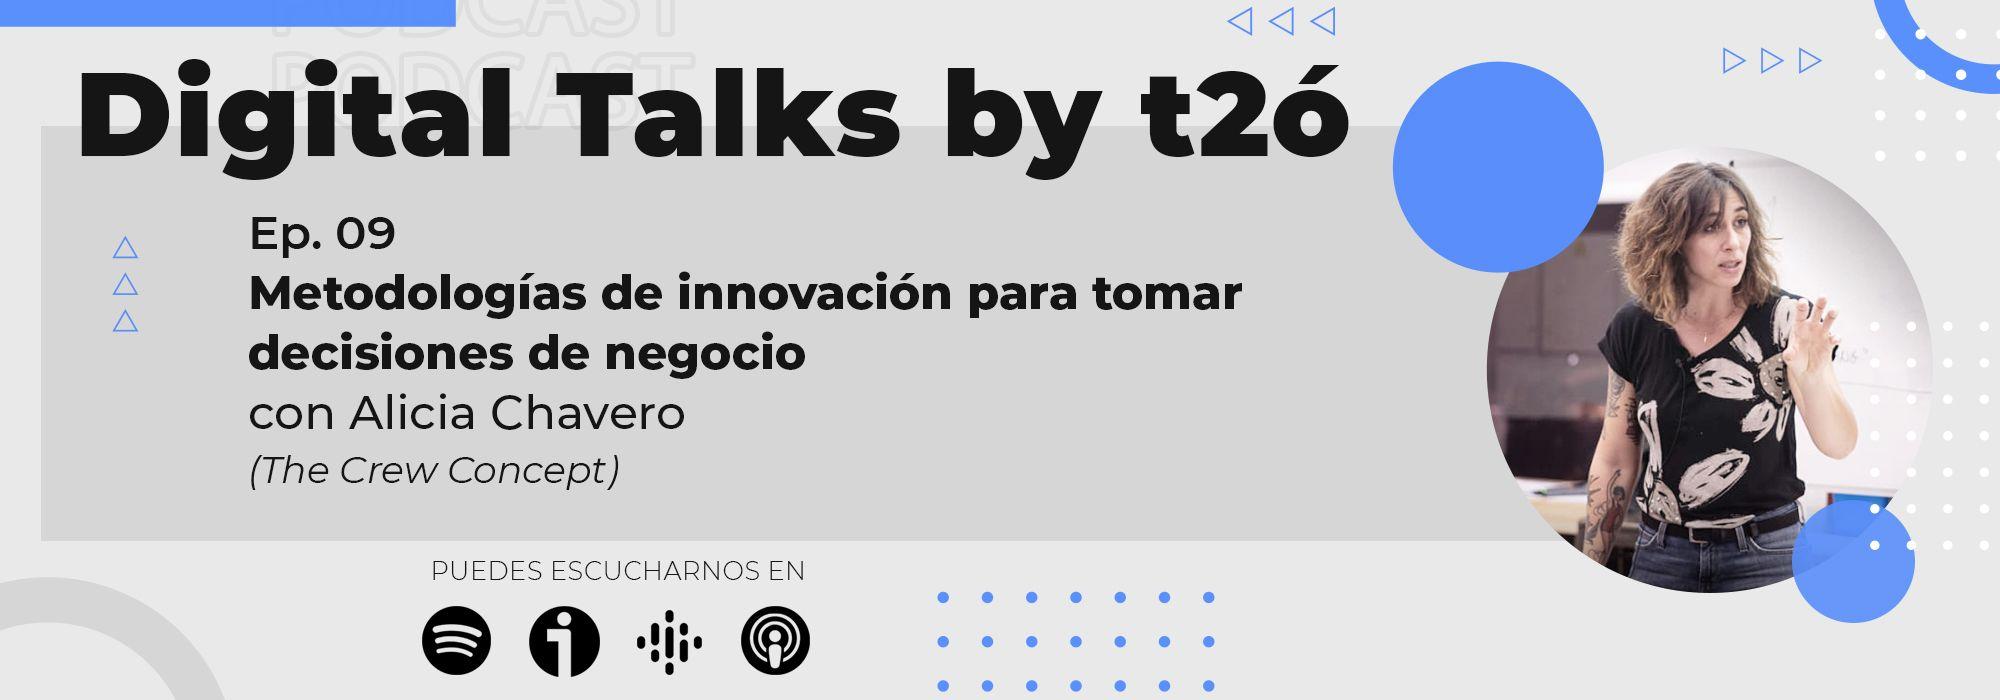 Metodologias Innovacion Digital Talks by t2ó